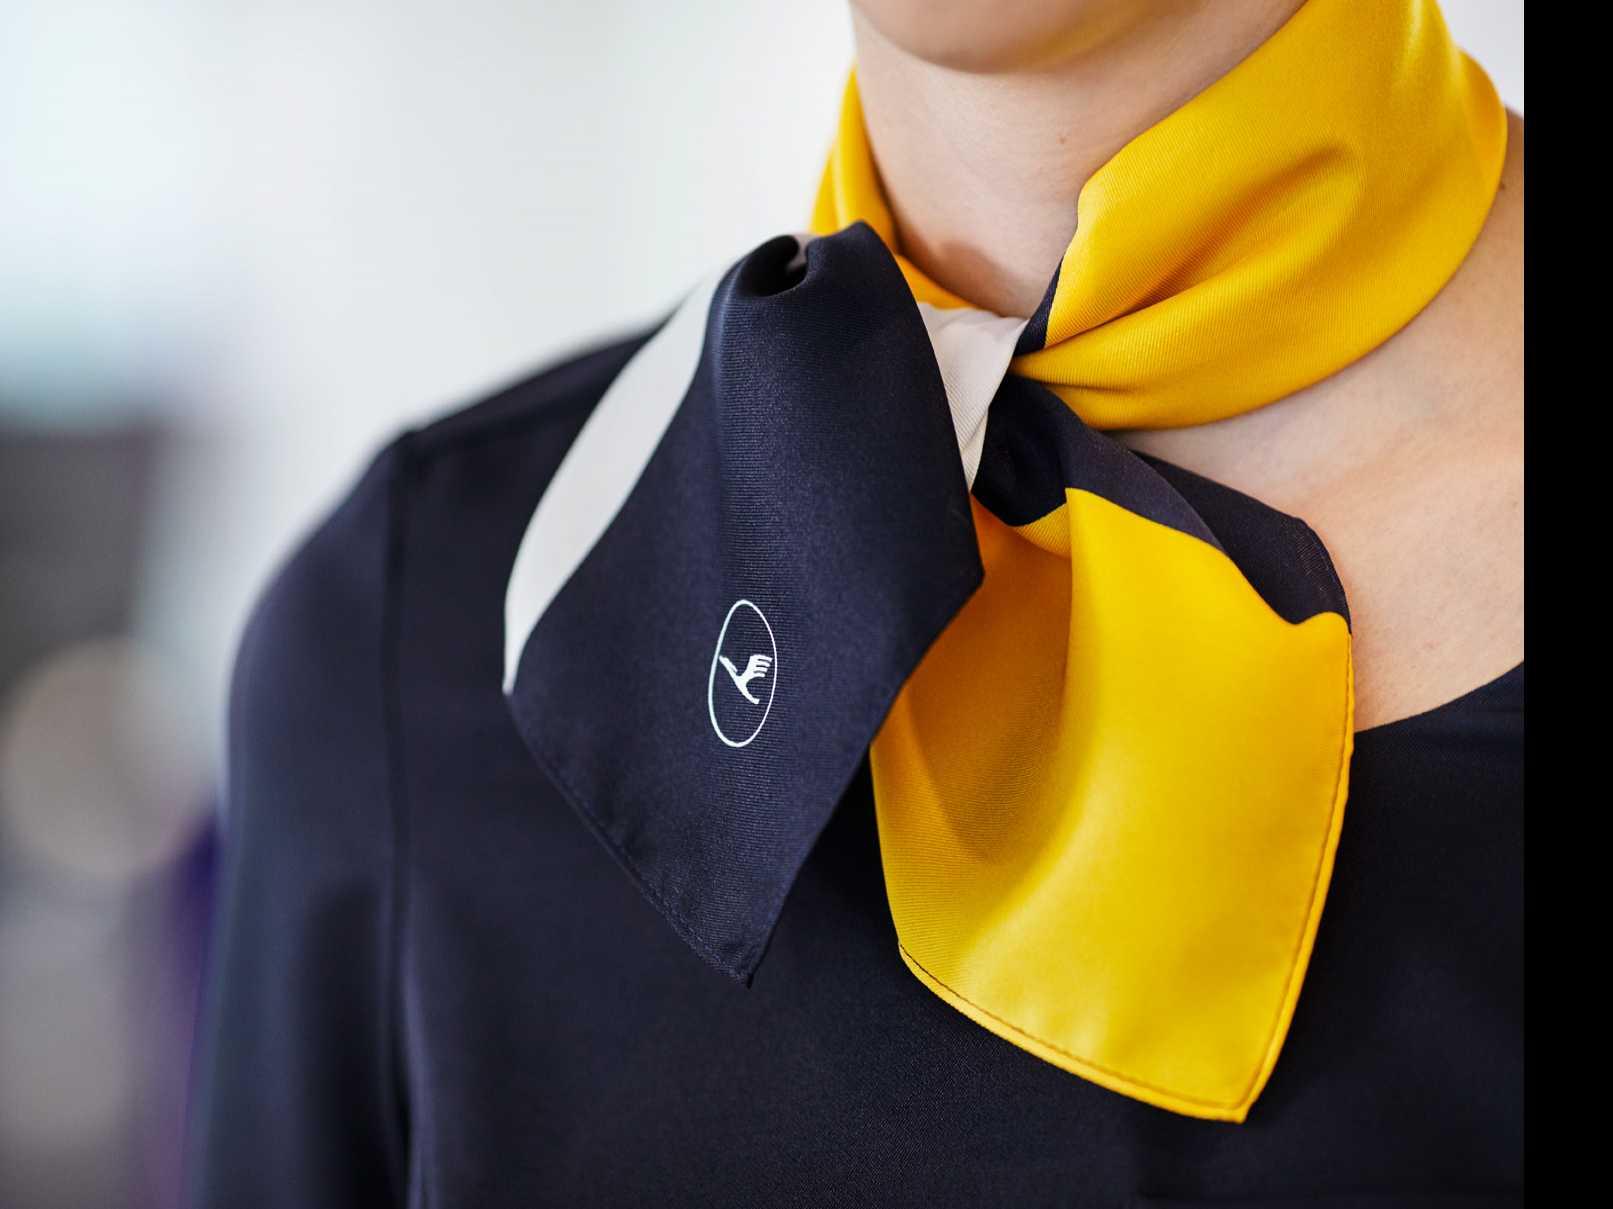 Lufthansa's New Look